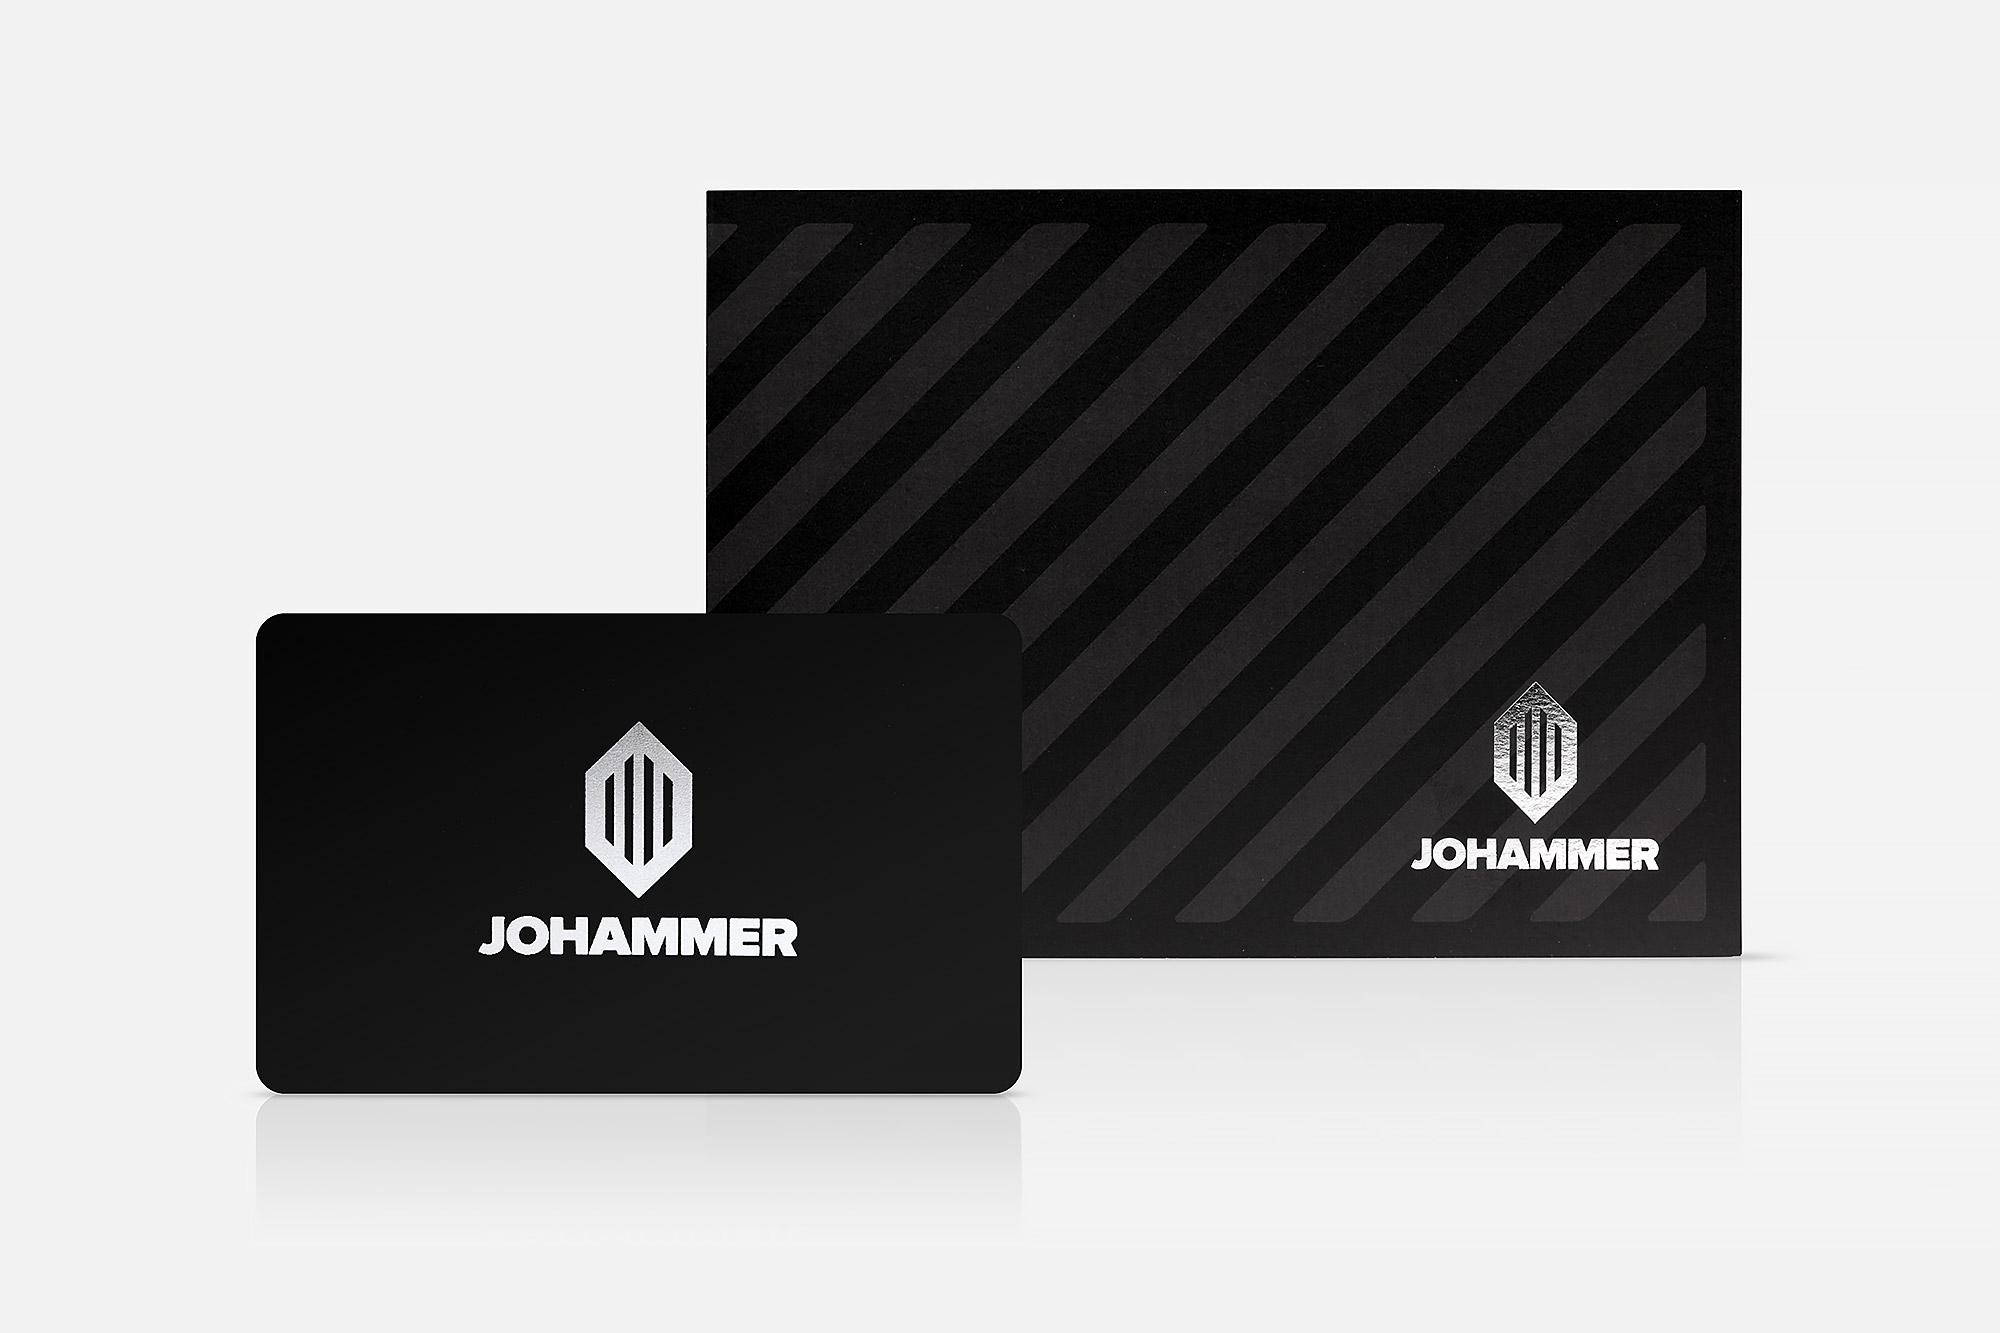 Johammer Voucher: the Perfect Gift Idea | JOHAMMER e-mobility